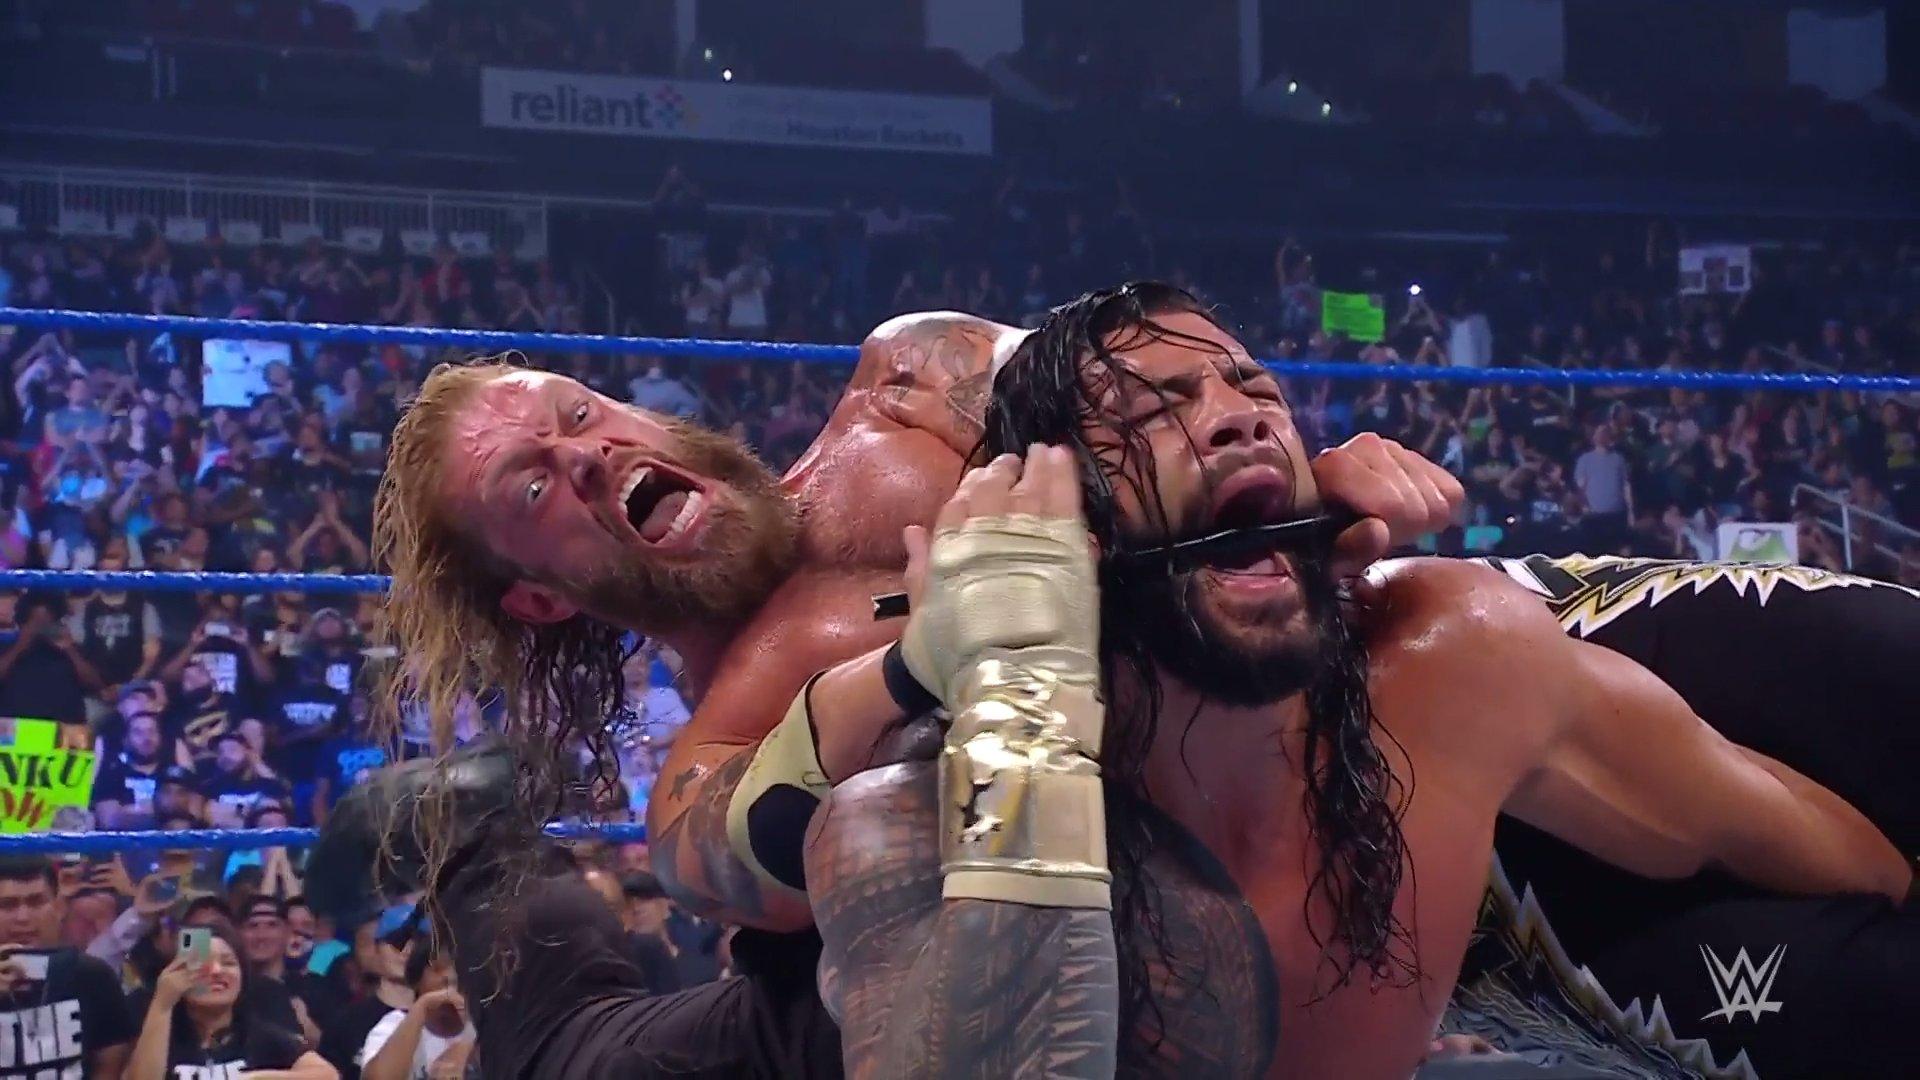 Smackdown July 16 Post-Show: Roman Reigns Shows Middle-Finger; Battle Royal 36